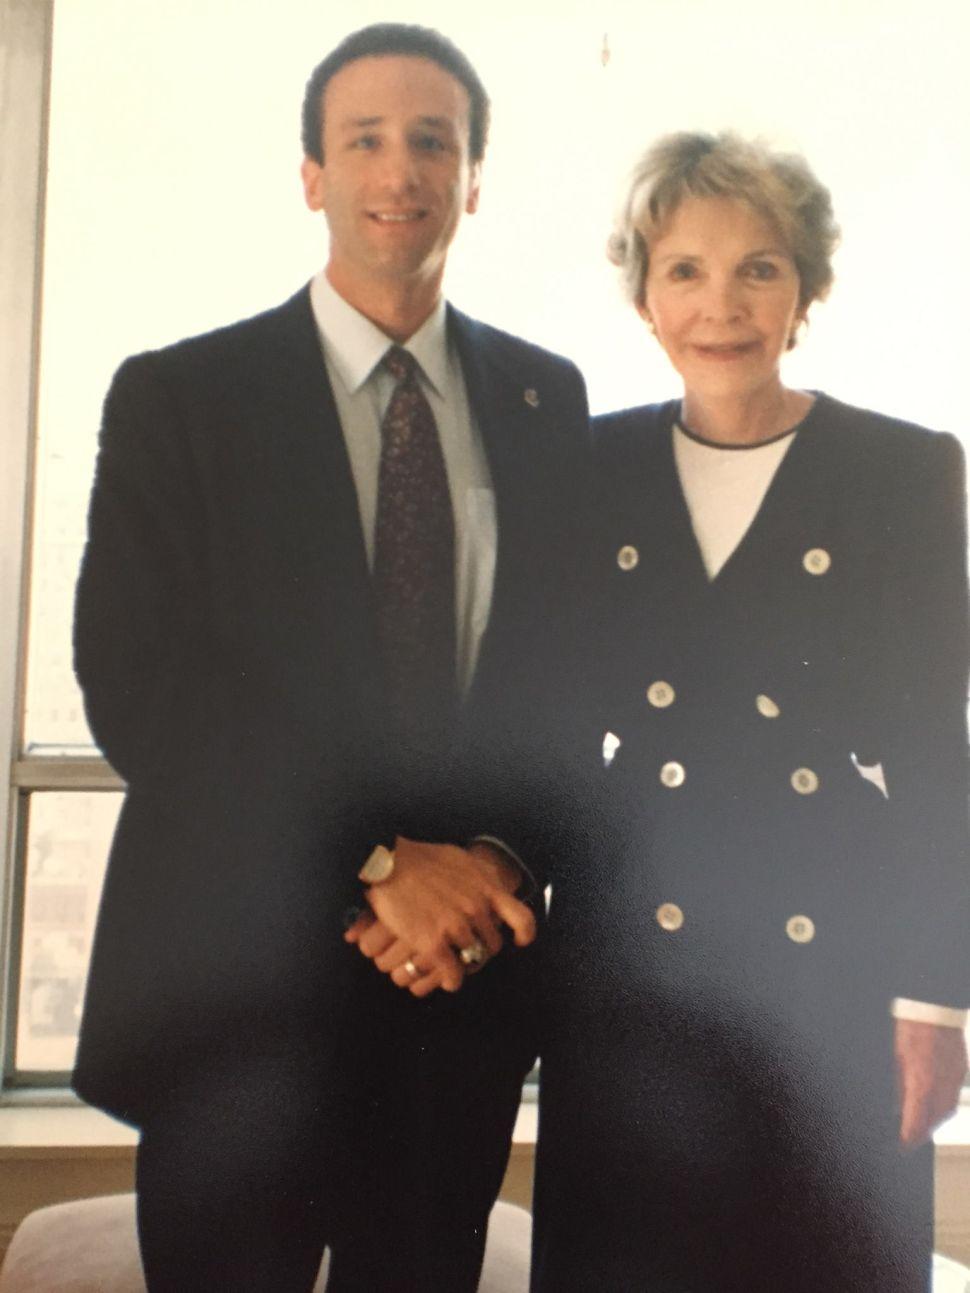 The Night Nancy Reagan Met Michael Jackson, As Told by the Secret Service